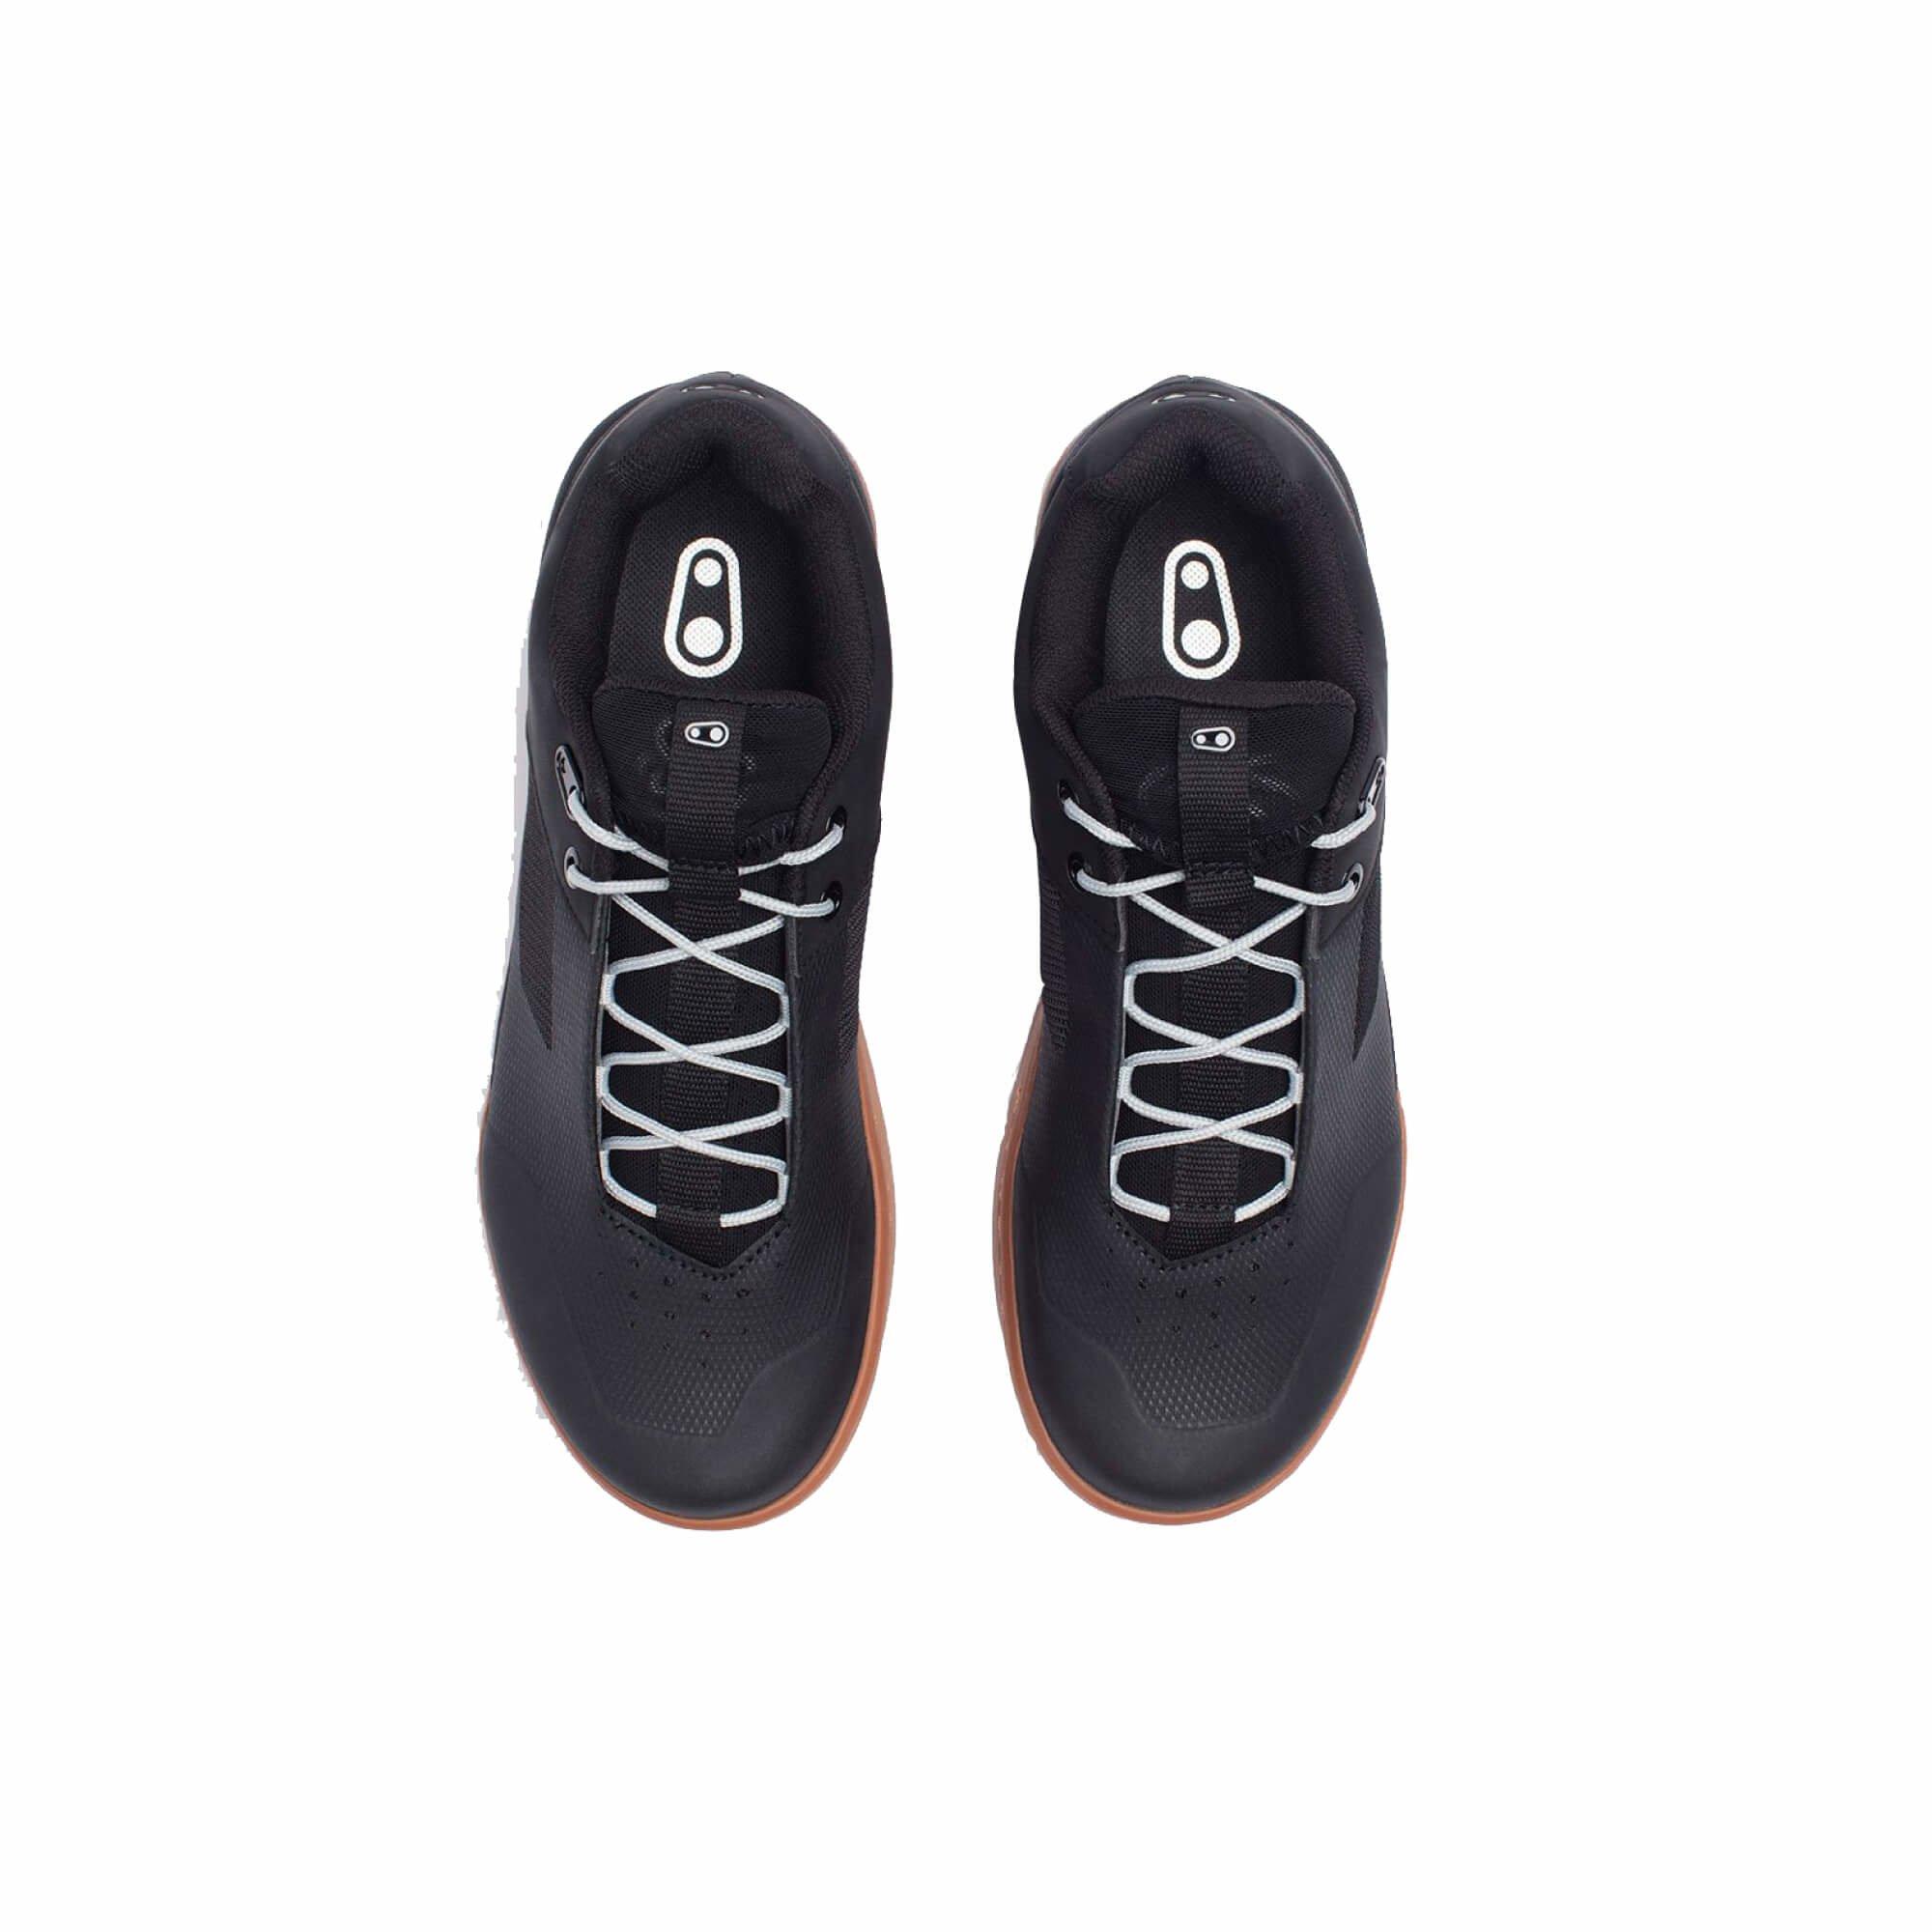 Shoe Stamp Lace Flat-6